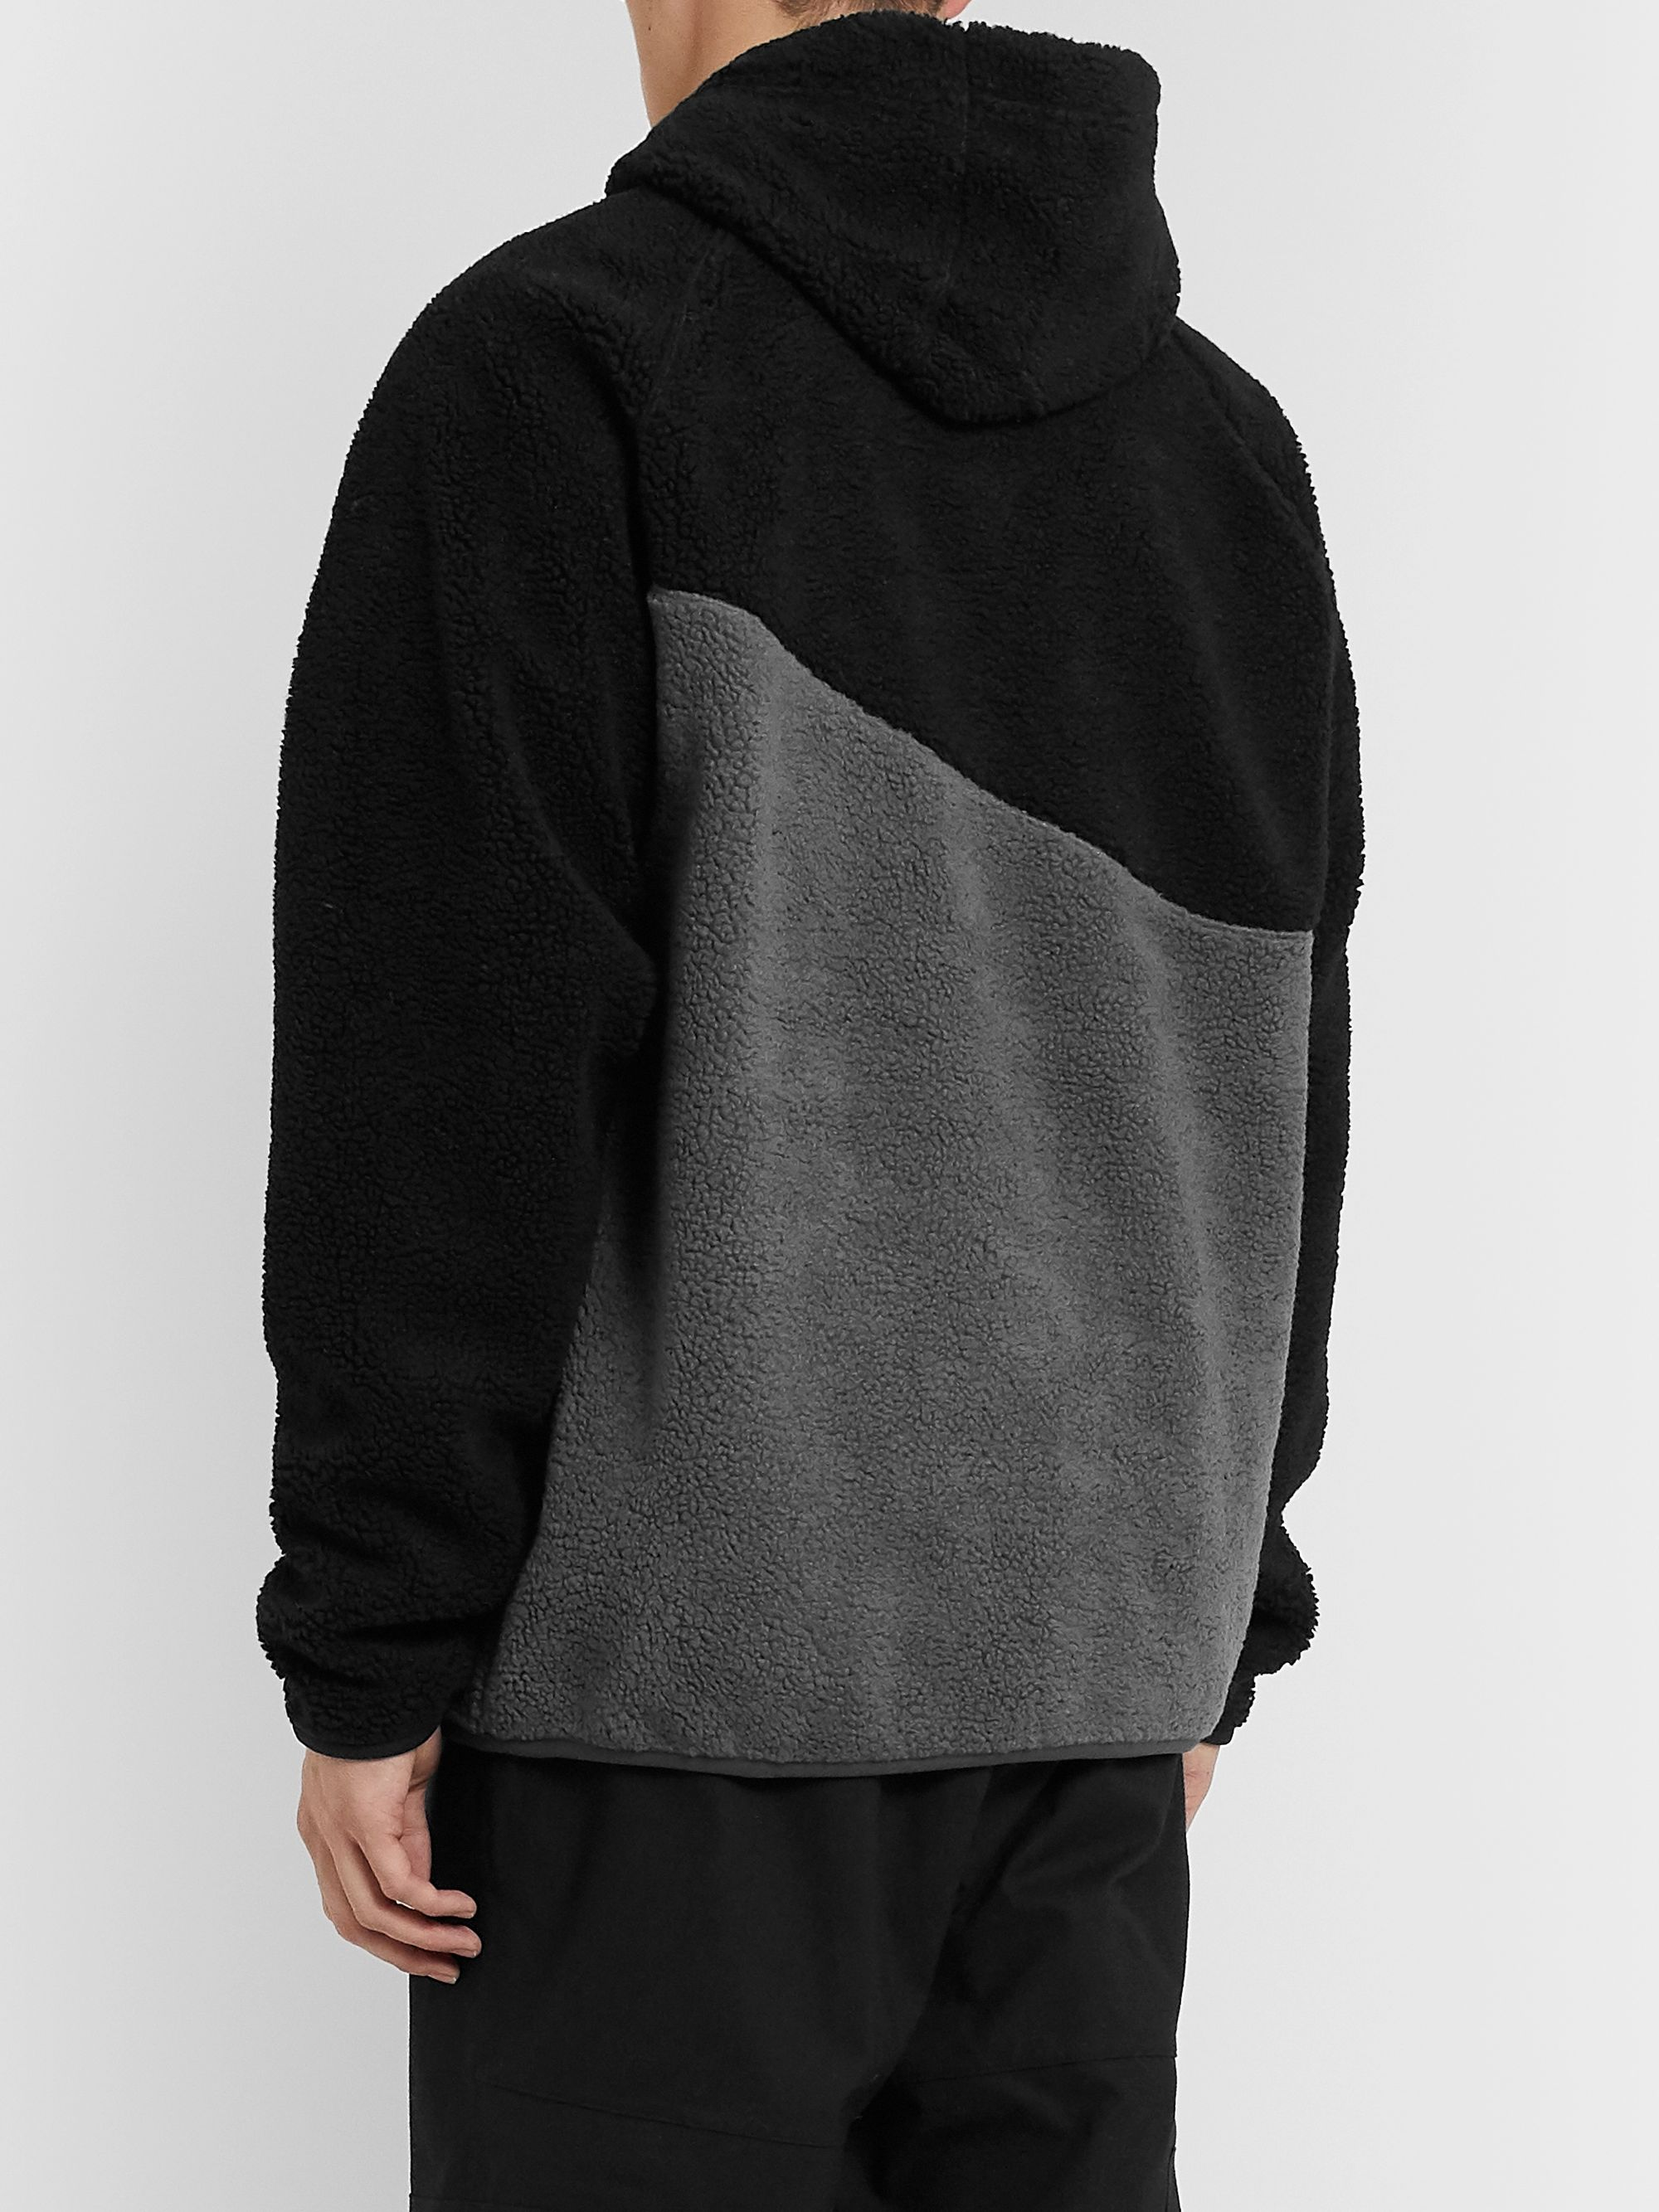 Nike Sportswear Logo Embroidered Two Tone Fleece Hoodie Black